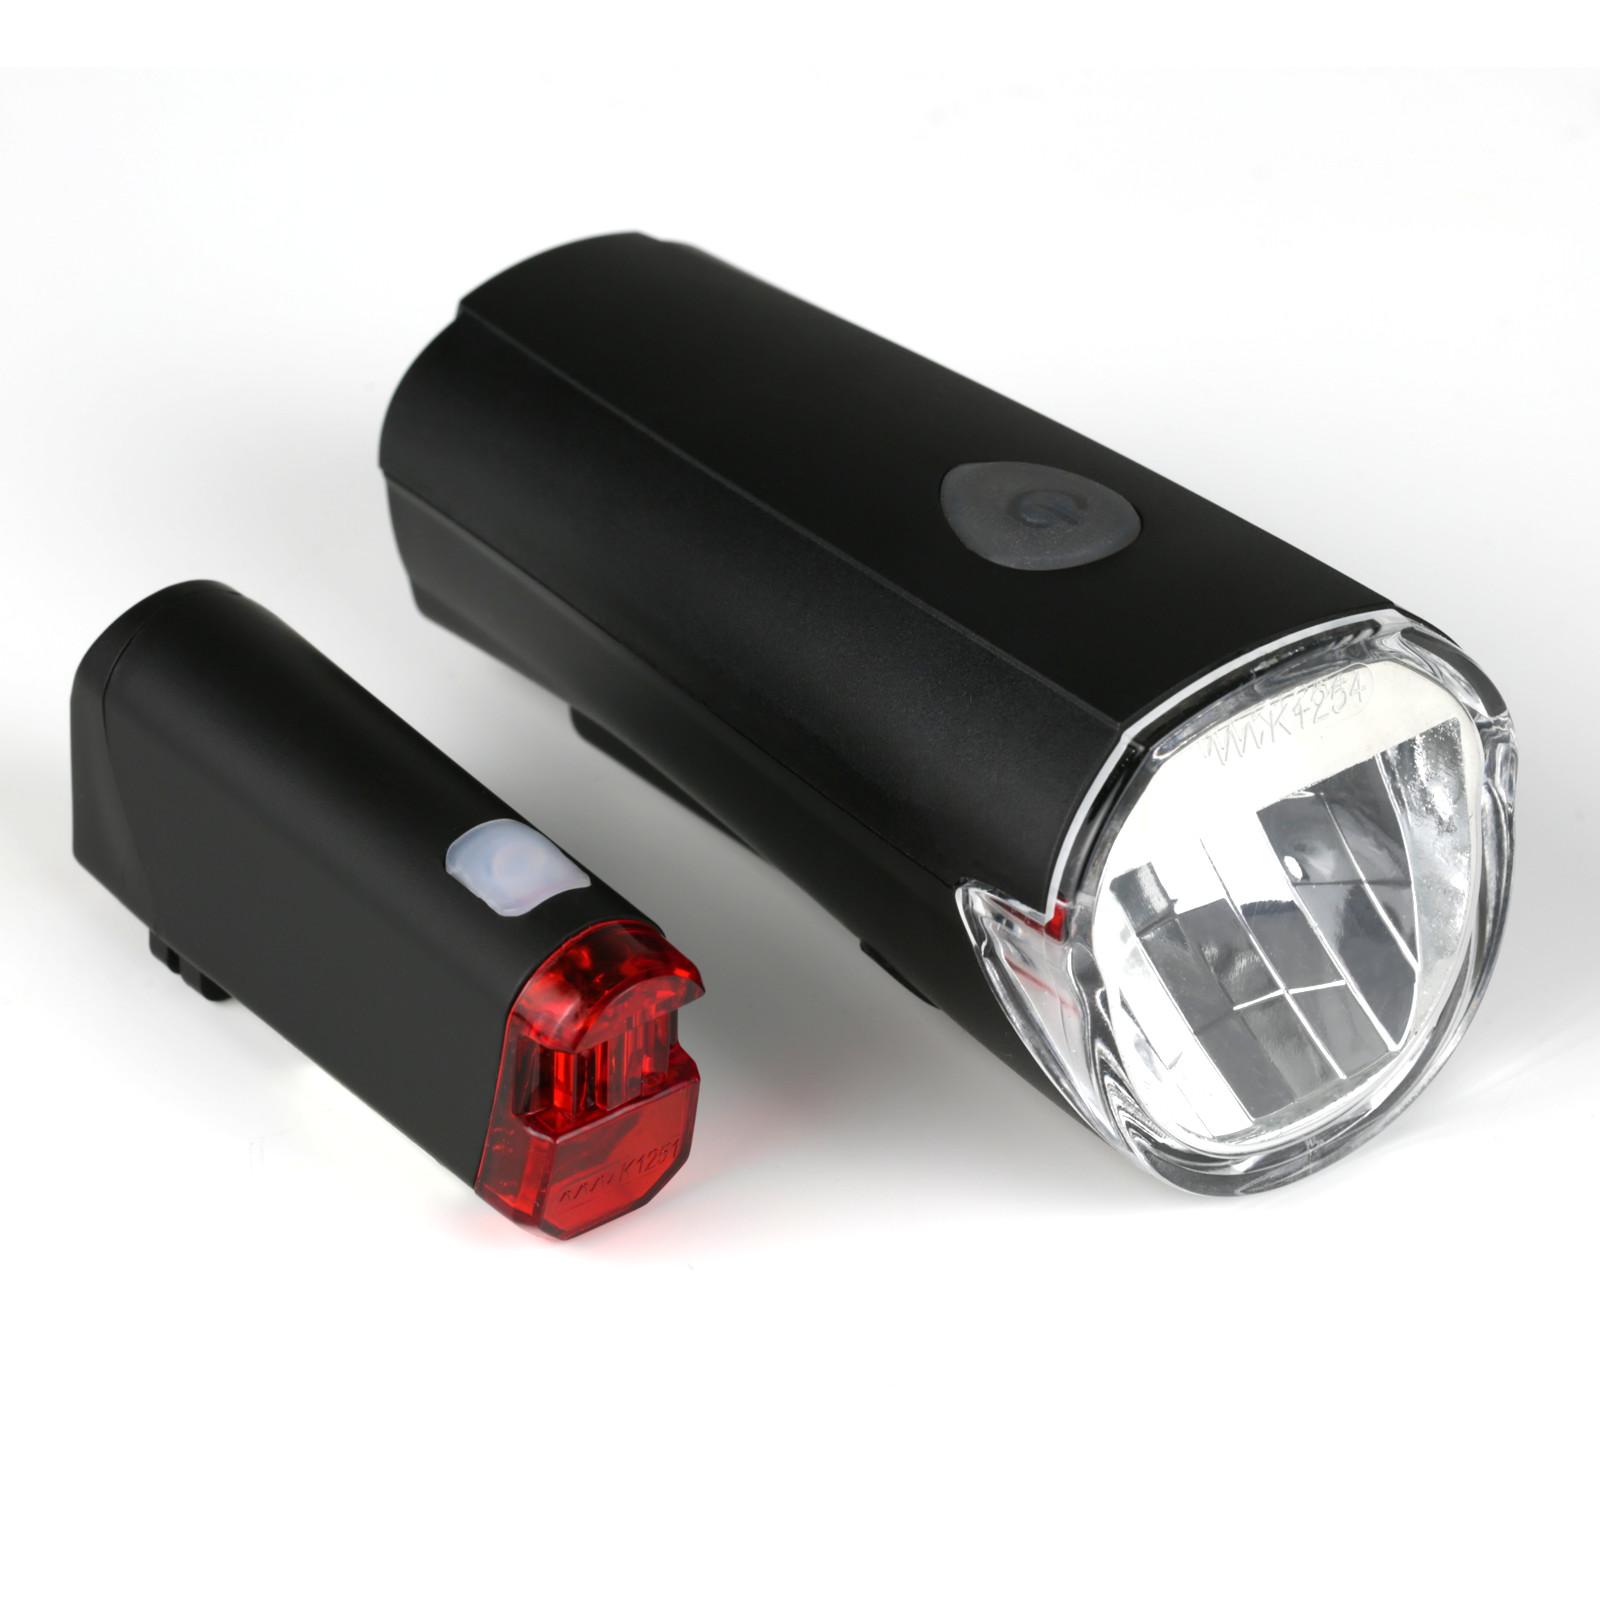 fahrrad led beleuchtungsset 30lux stvzo zugelassen batteriebetrieb ebay. Black Bedroom Furniture Sets. Home Design Ideas